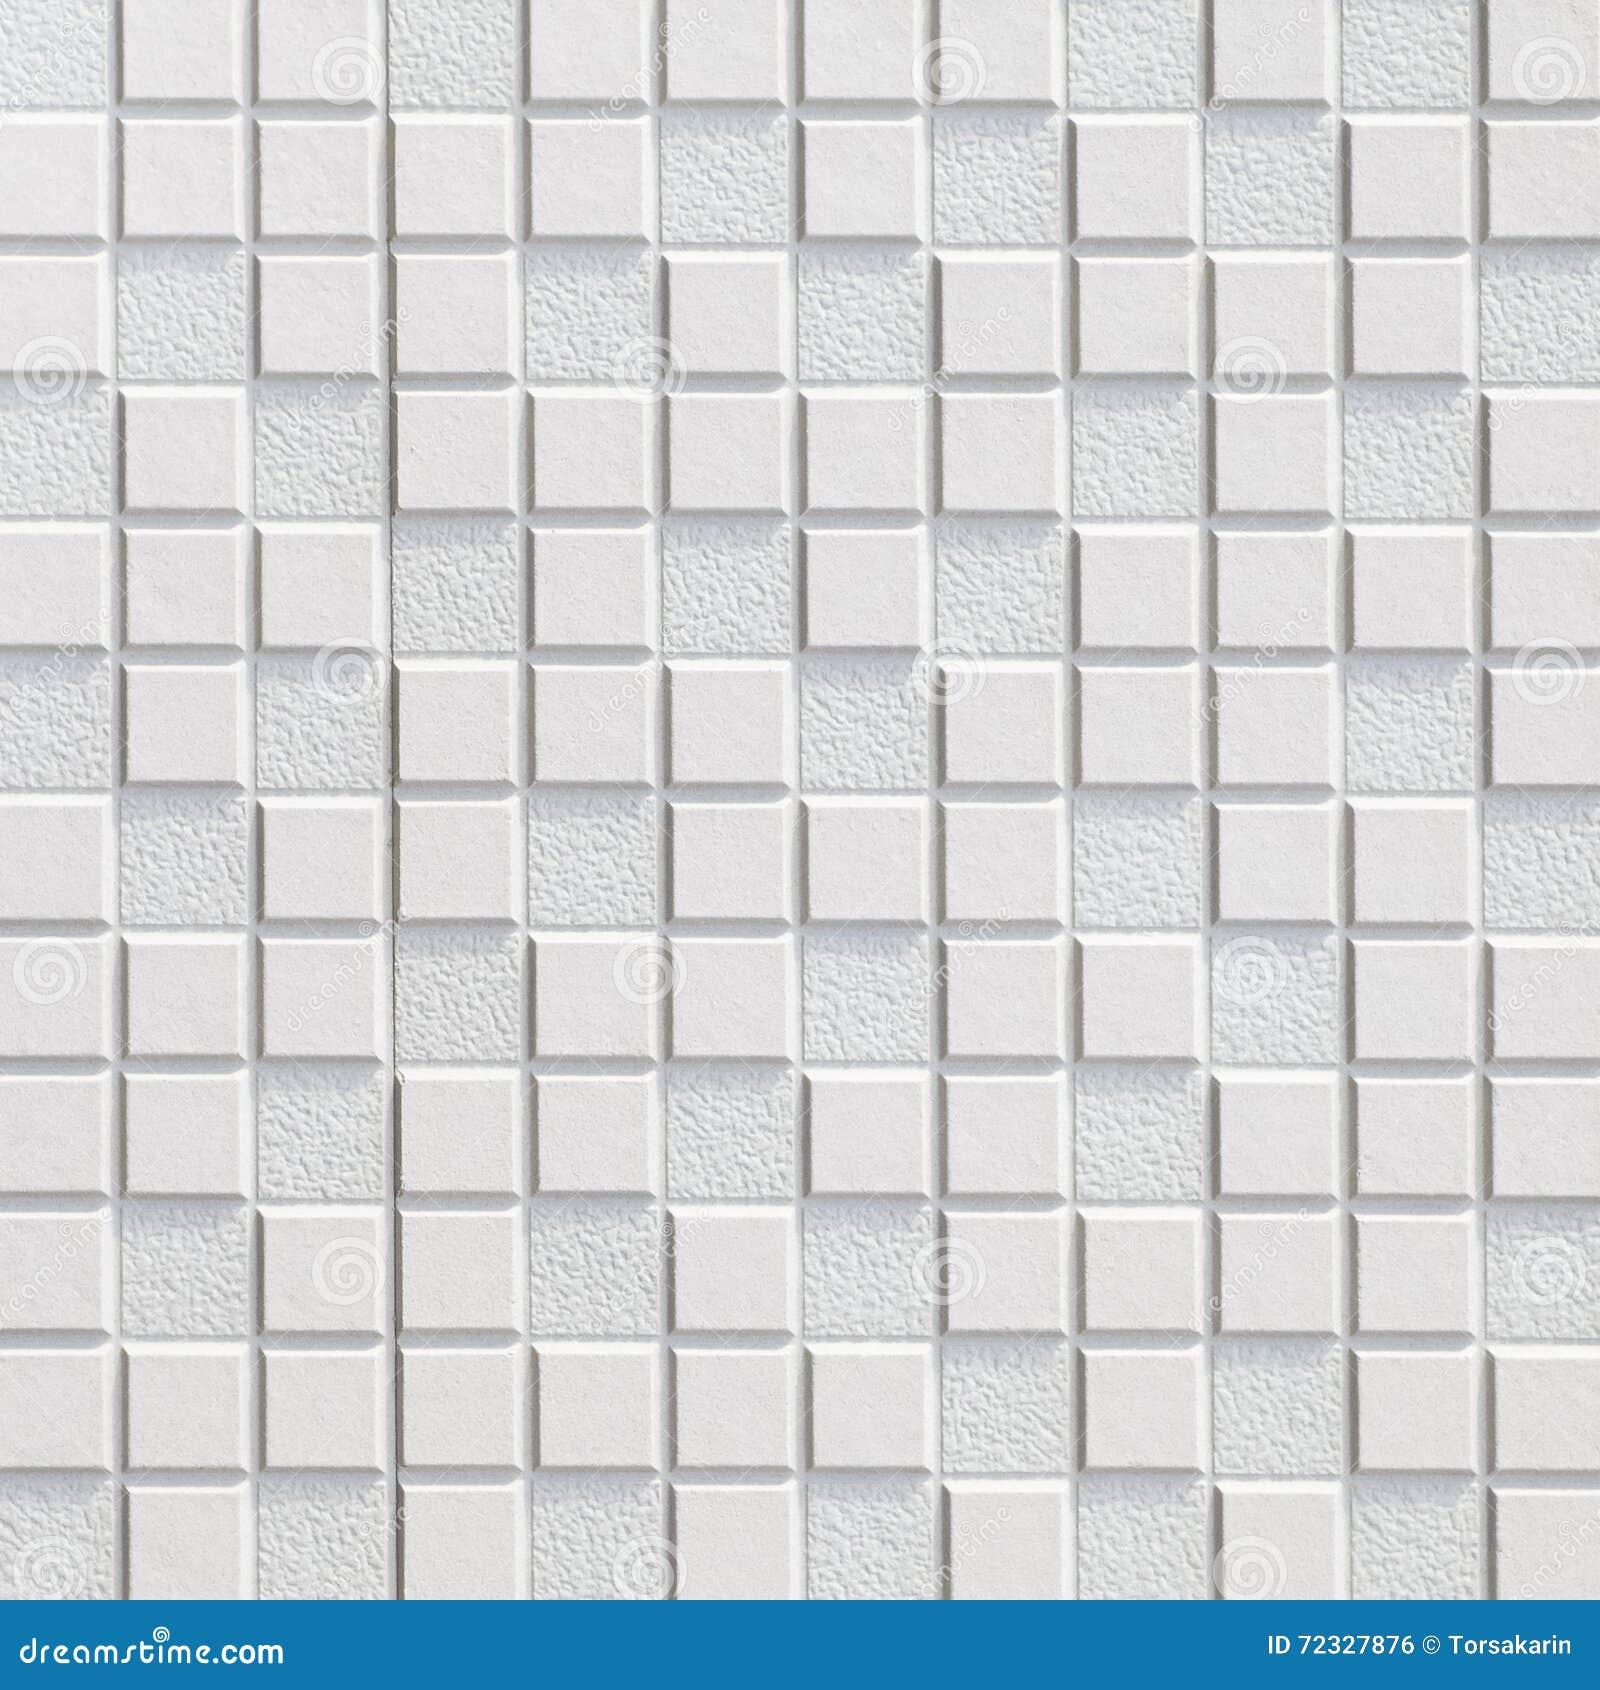 Concrete tile wall texture and background  Concrete Tile Wall Texture And  Background Stock Photo Image. Concrete Tile Textures   almosttacticalreviews com